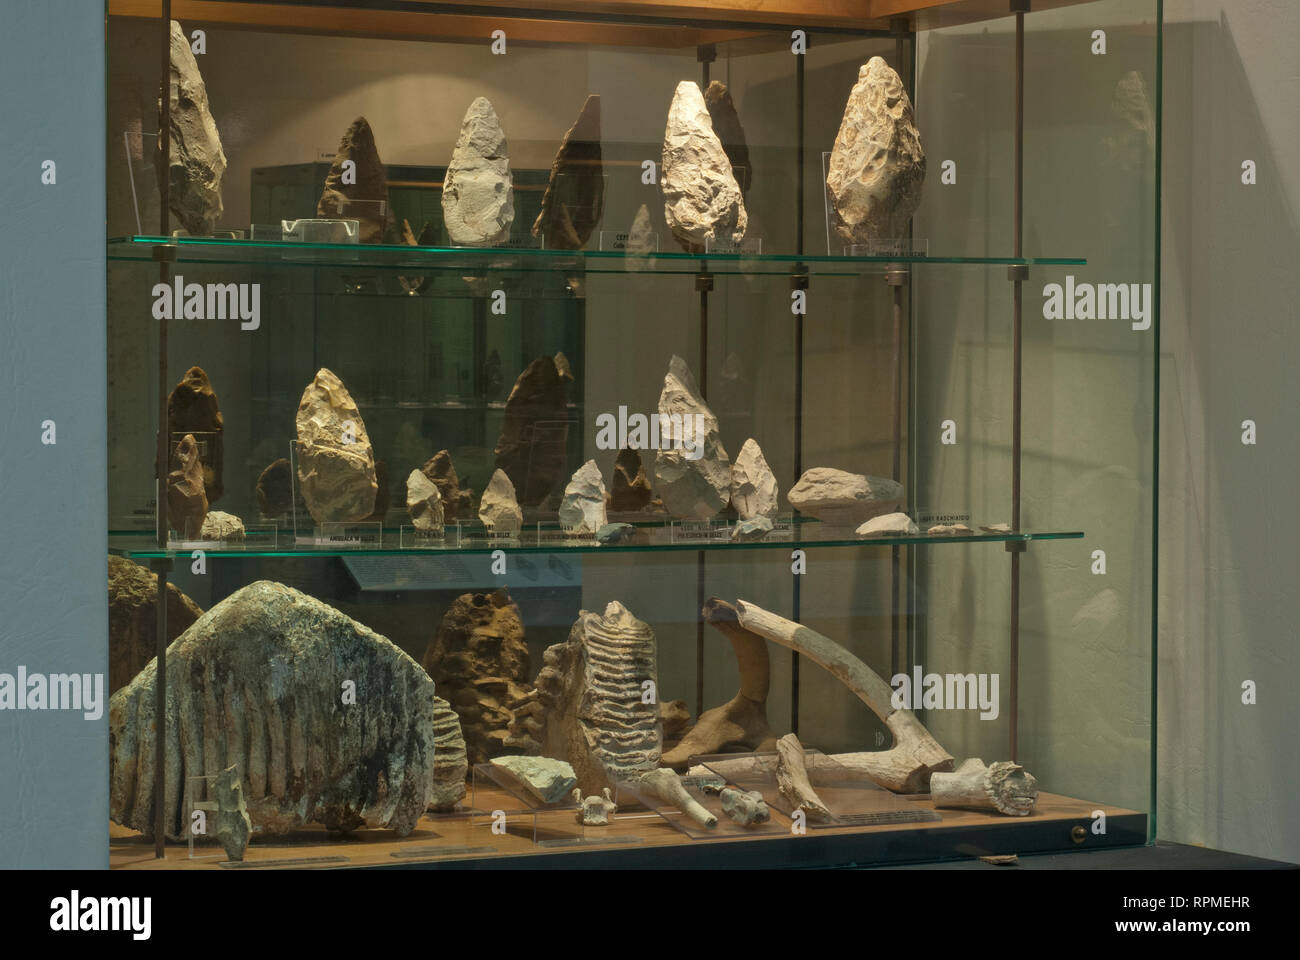 Prehistoric tools and remains of fossil animals, Prehistoric Museum of Pofi, Lazio, Italy - Stock Image